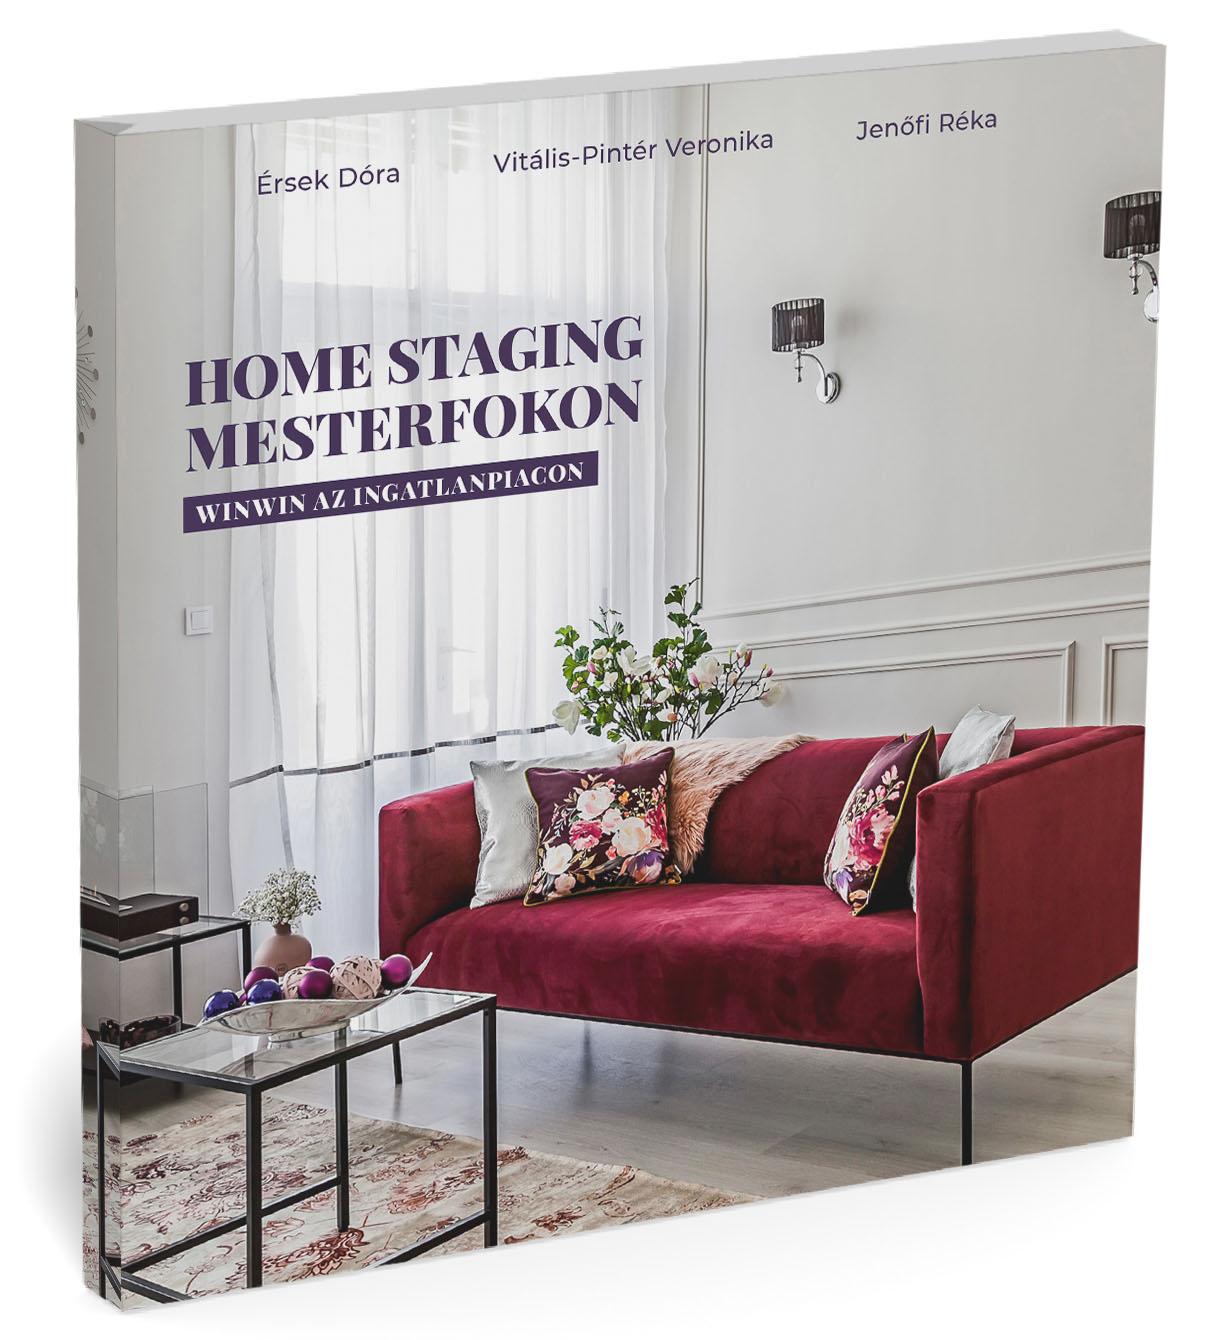 első home staging könyv magyarul